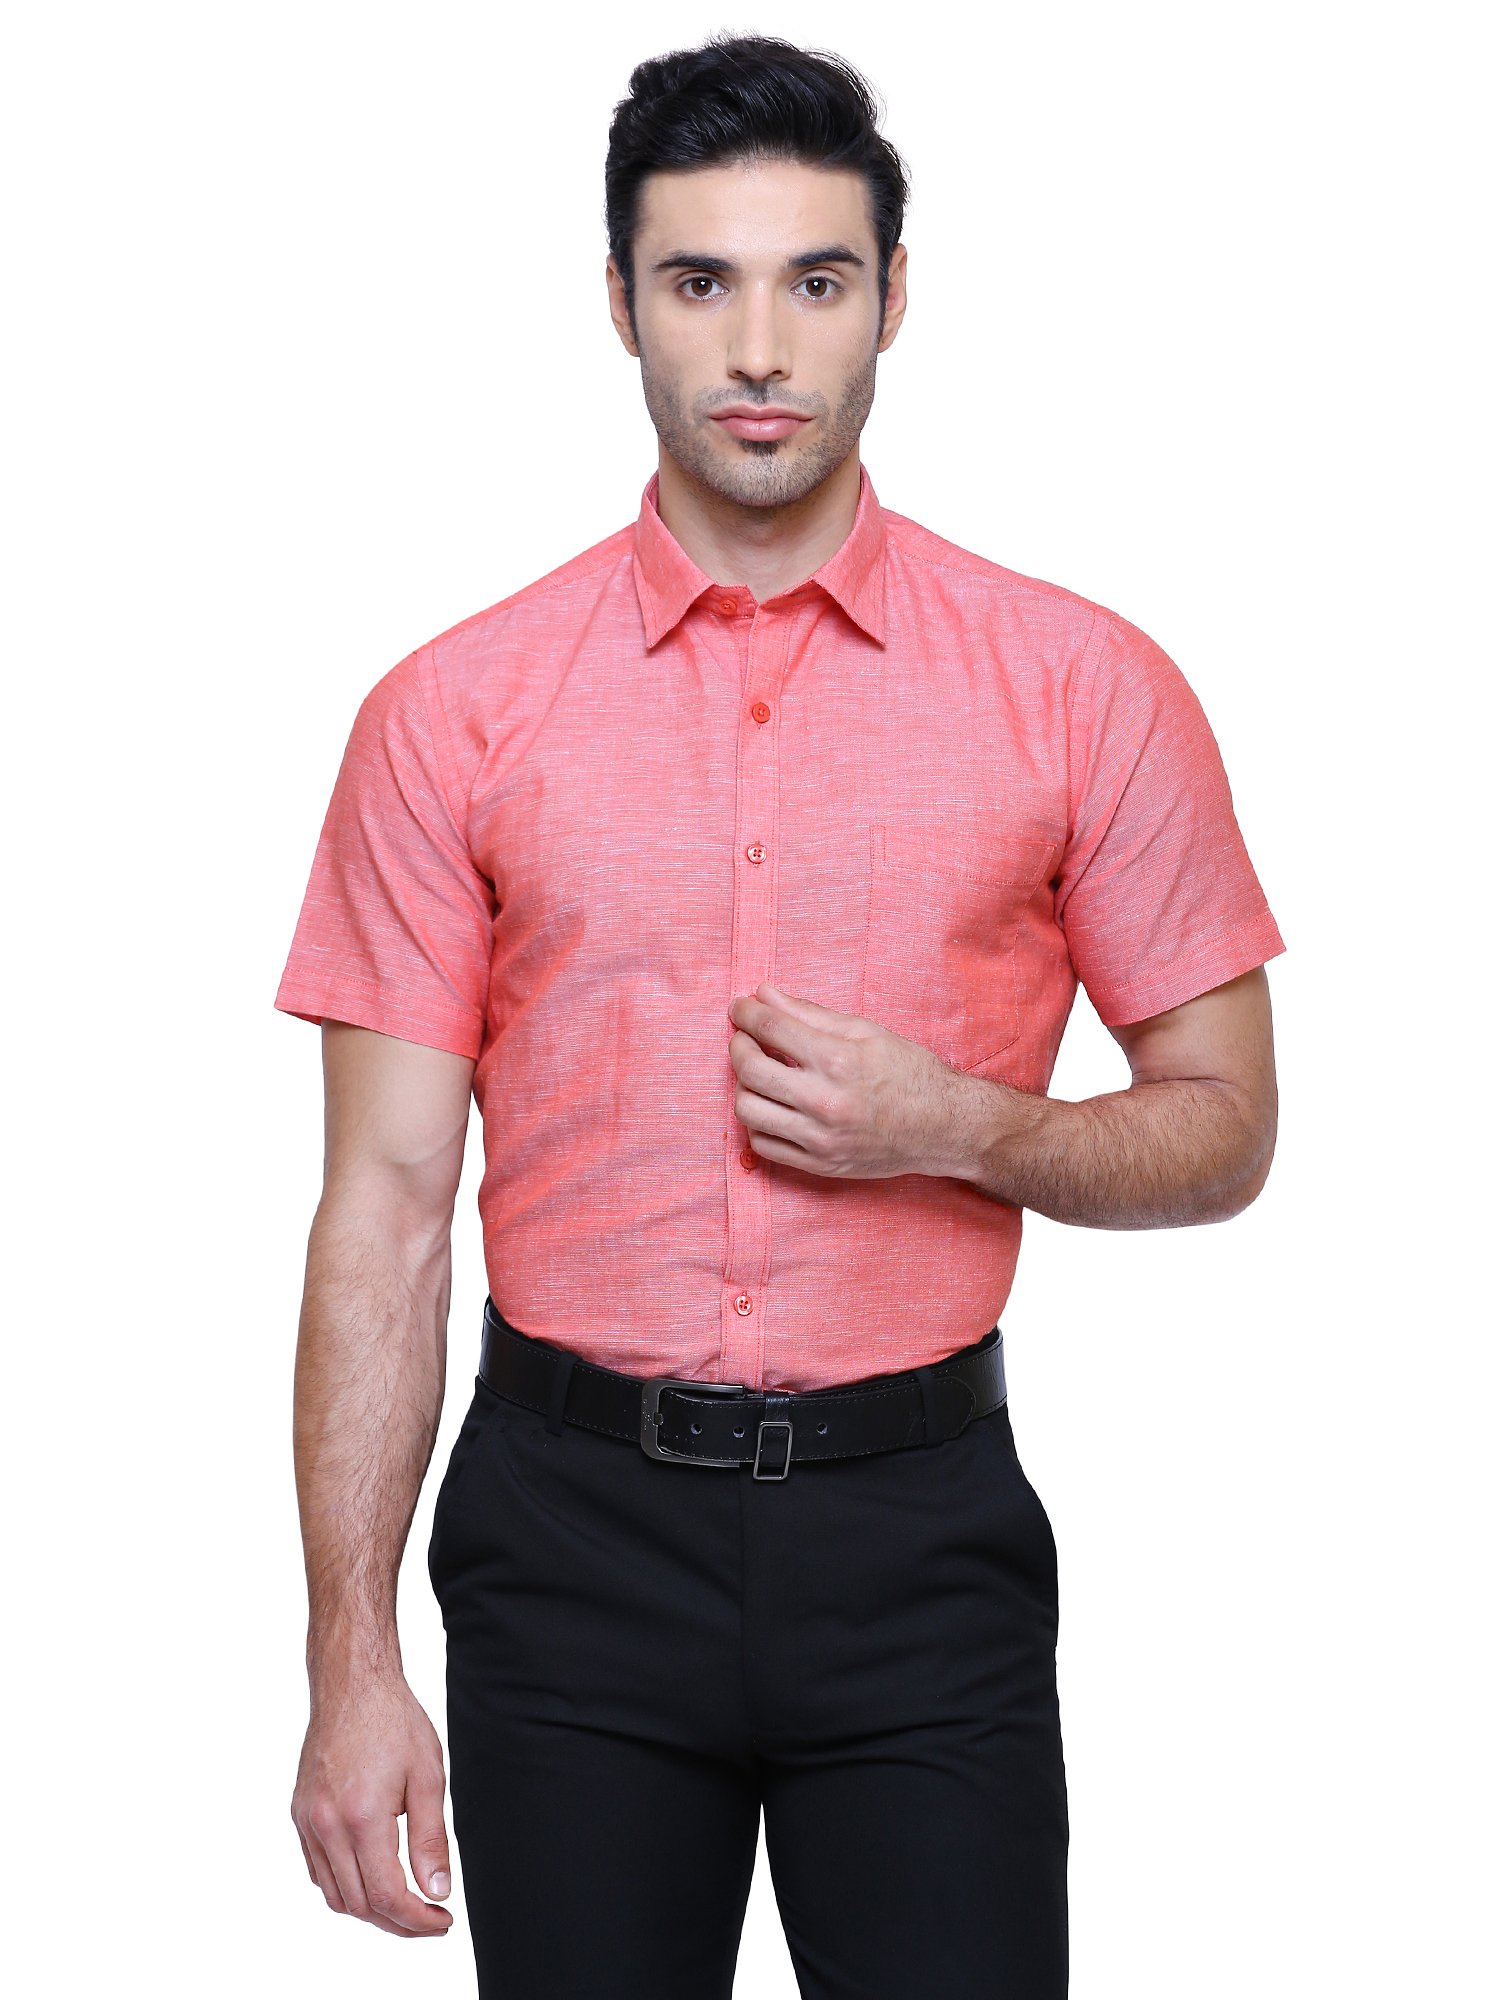 Southbay | Southbay Men's Salmon Pink Half Sleeve Linen Cotton Formal Shirt-SBCLHS231PK